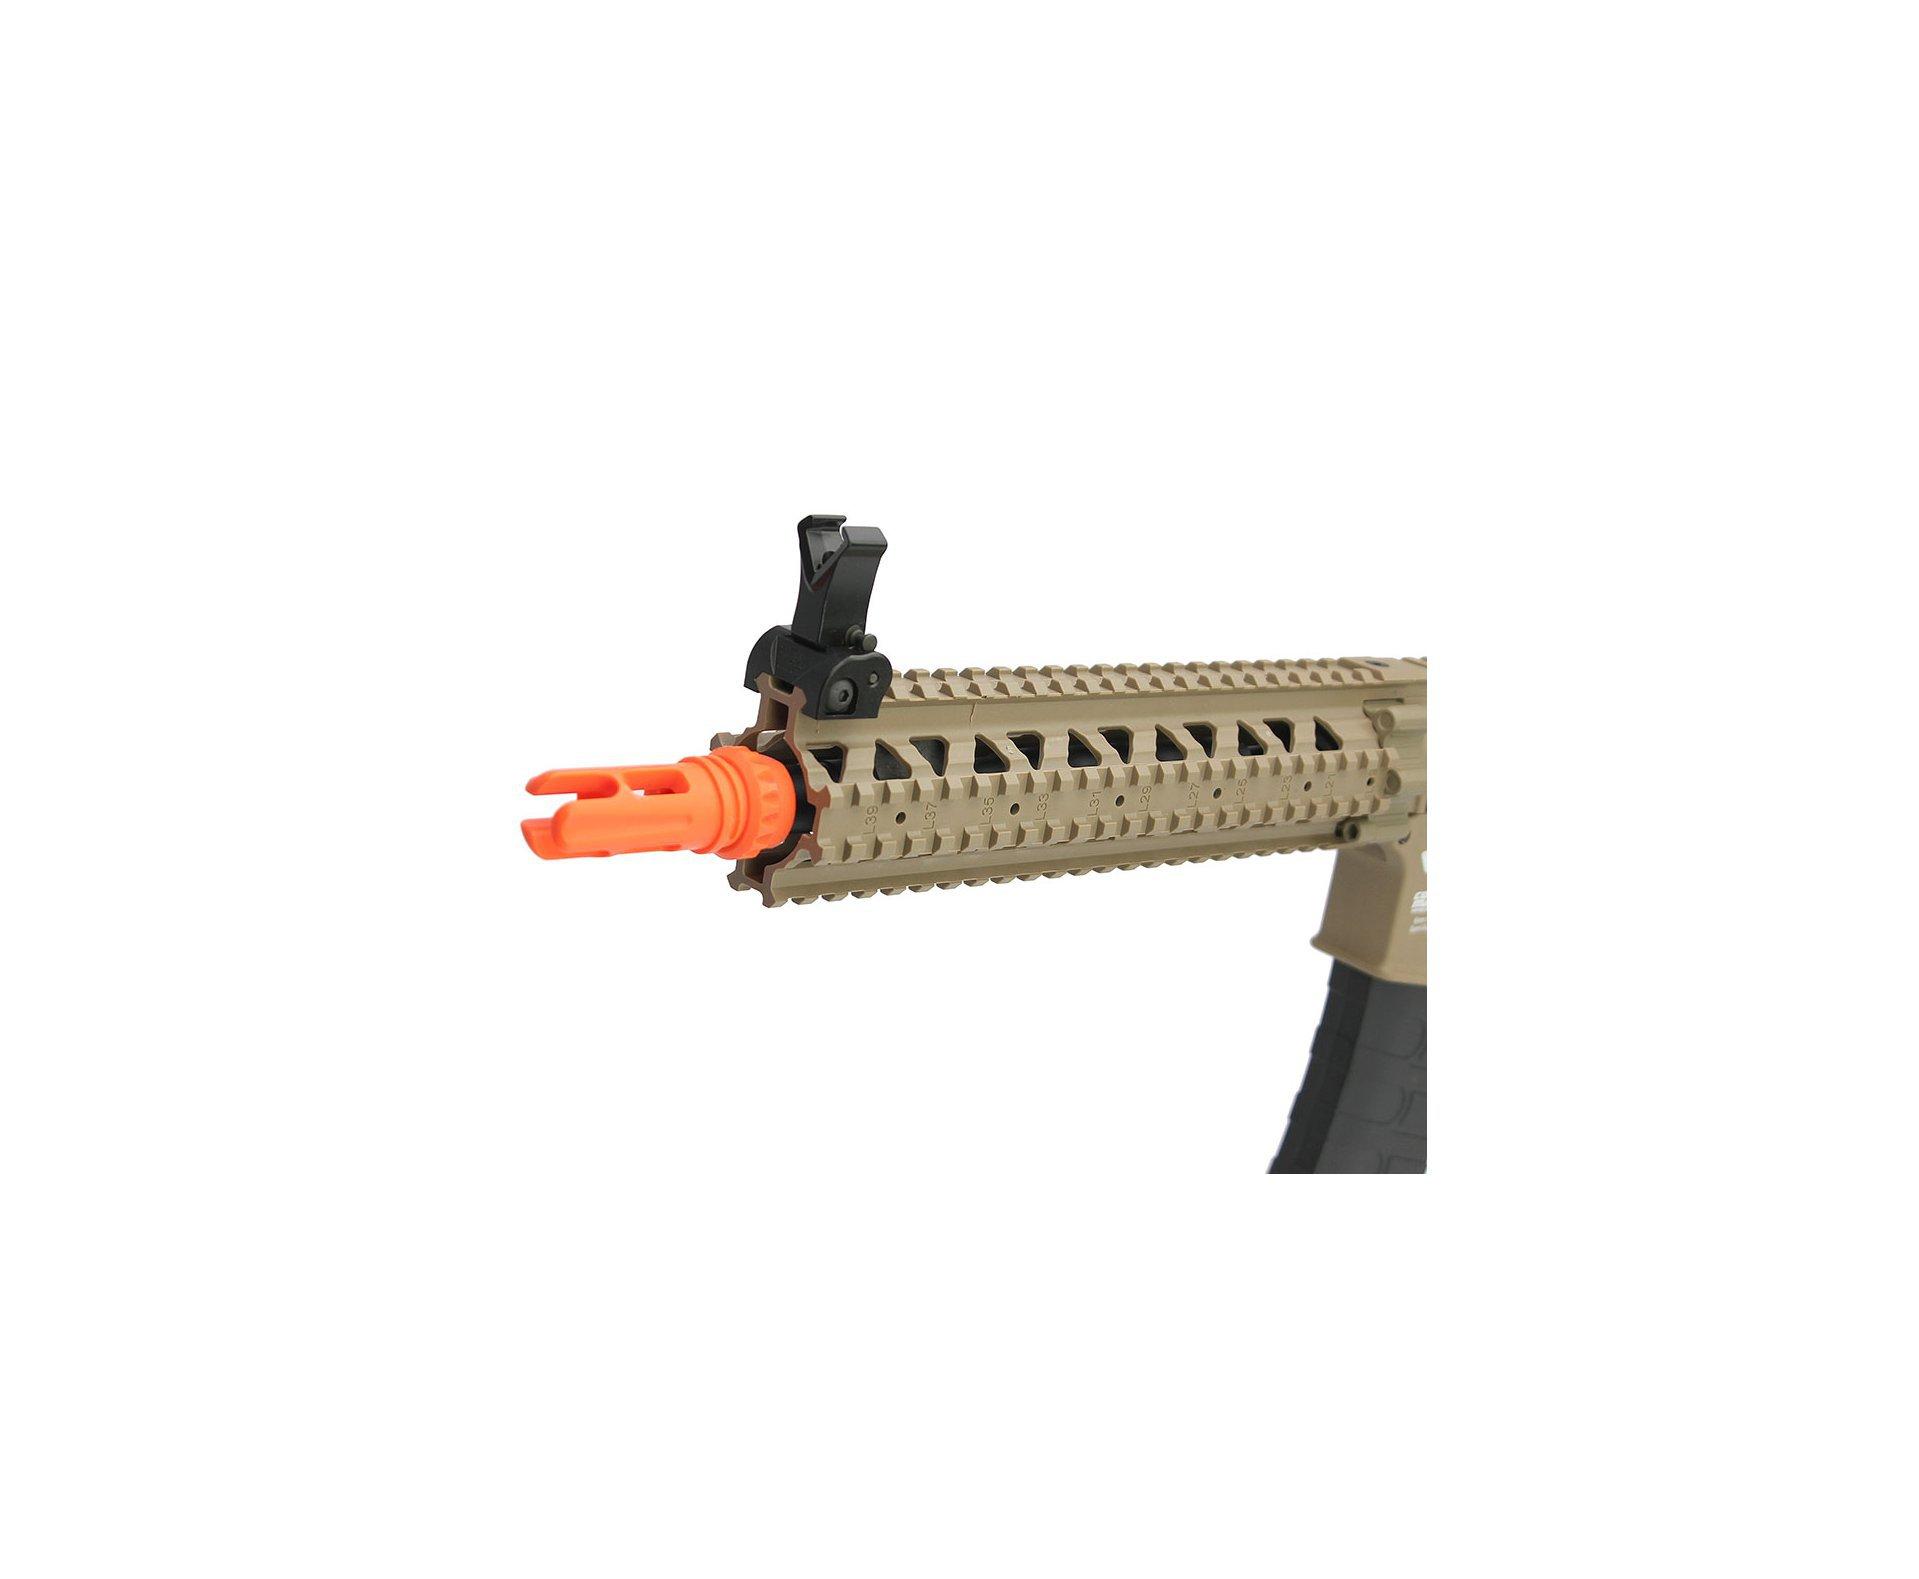 Rifle De Airsoft Cm18 Ris Mod 1 Dst Long - Calibre 6,0 Mm - Aeg - G&g